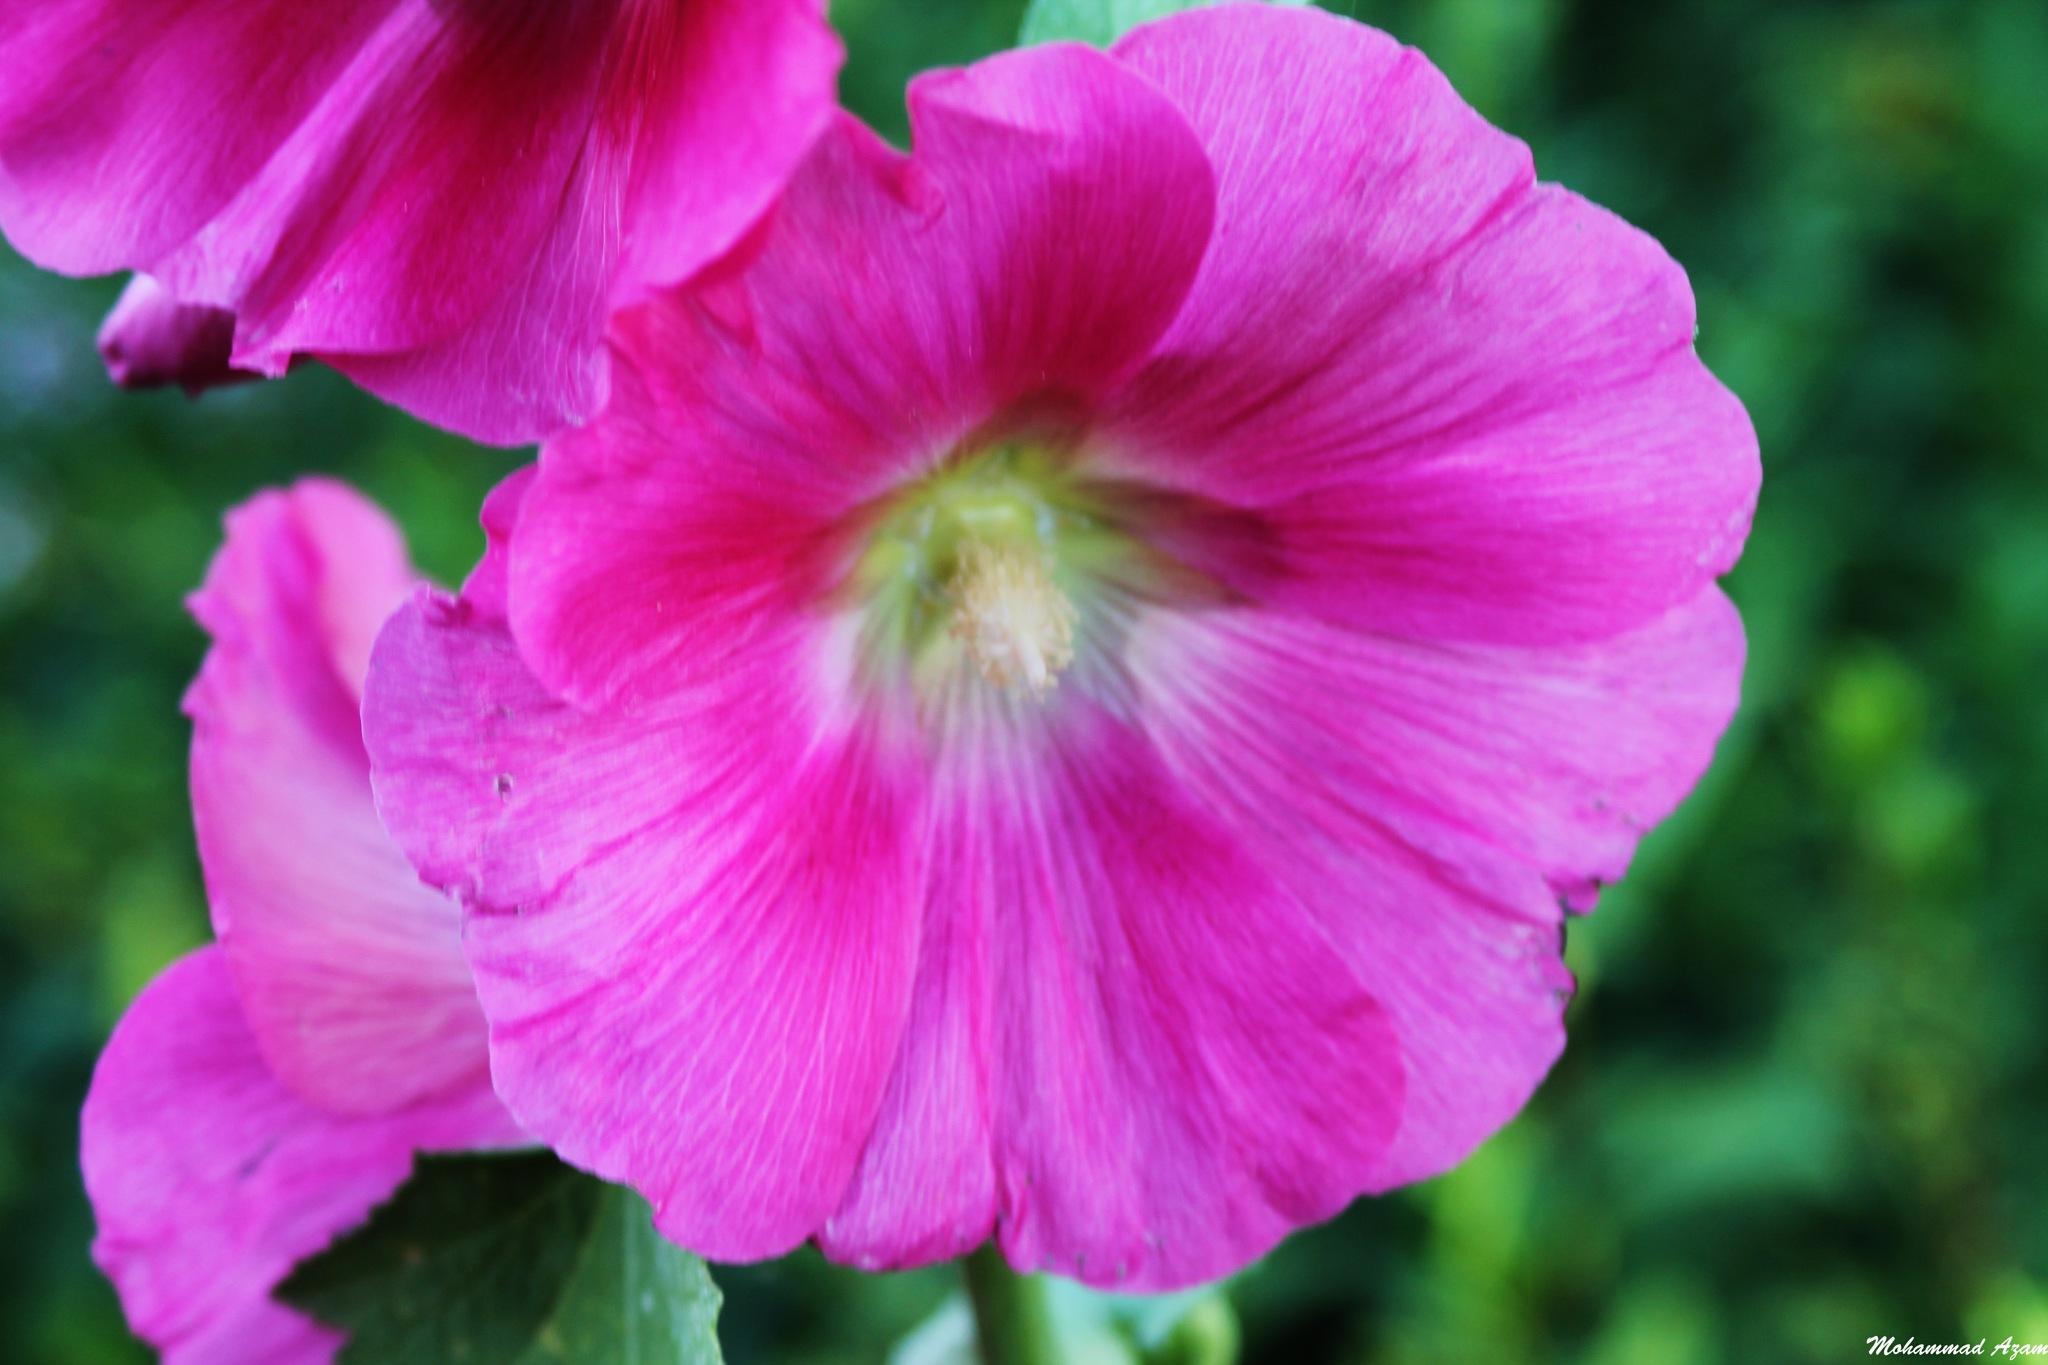 Flower 64 by Mohammad Azam